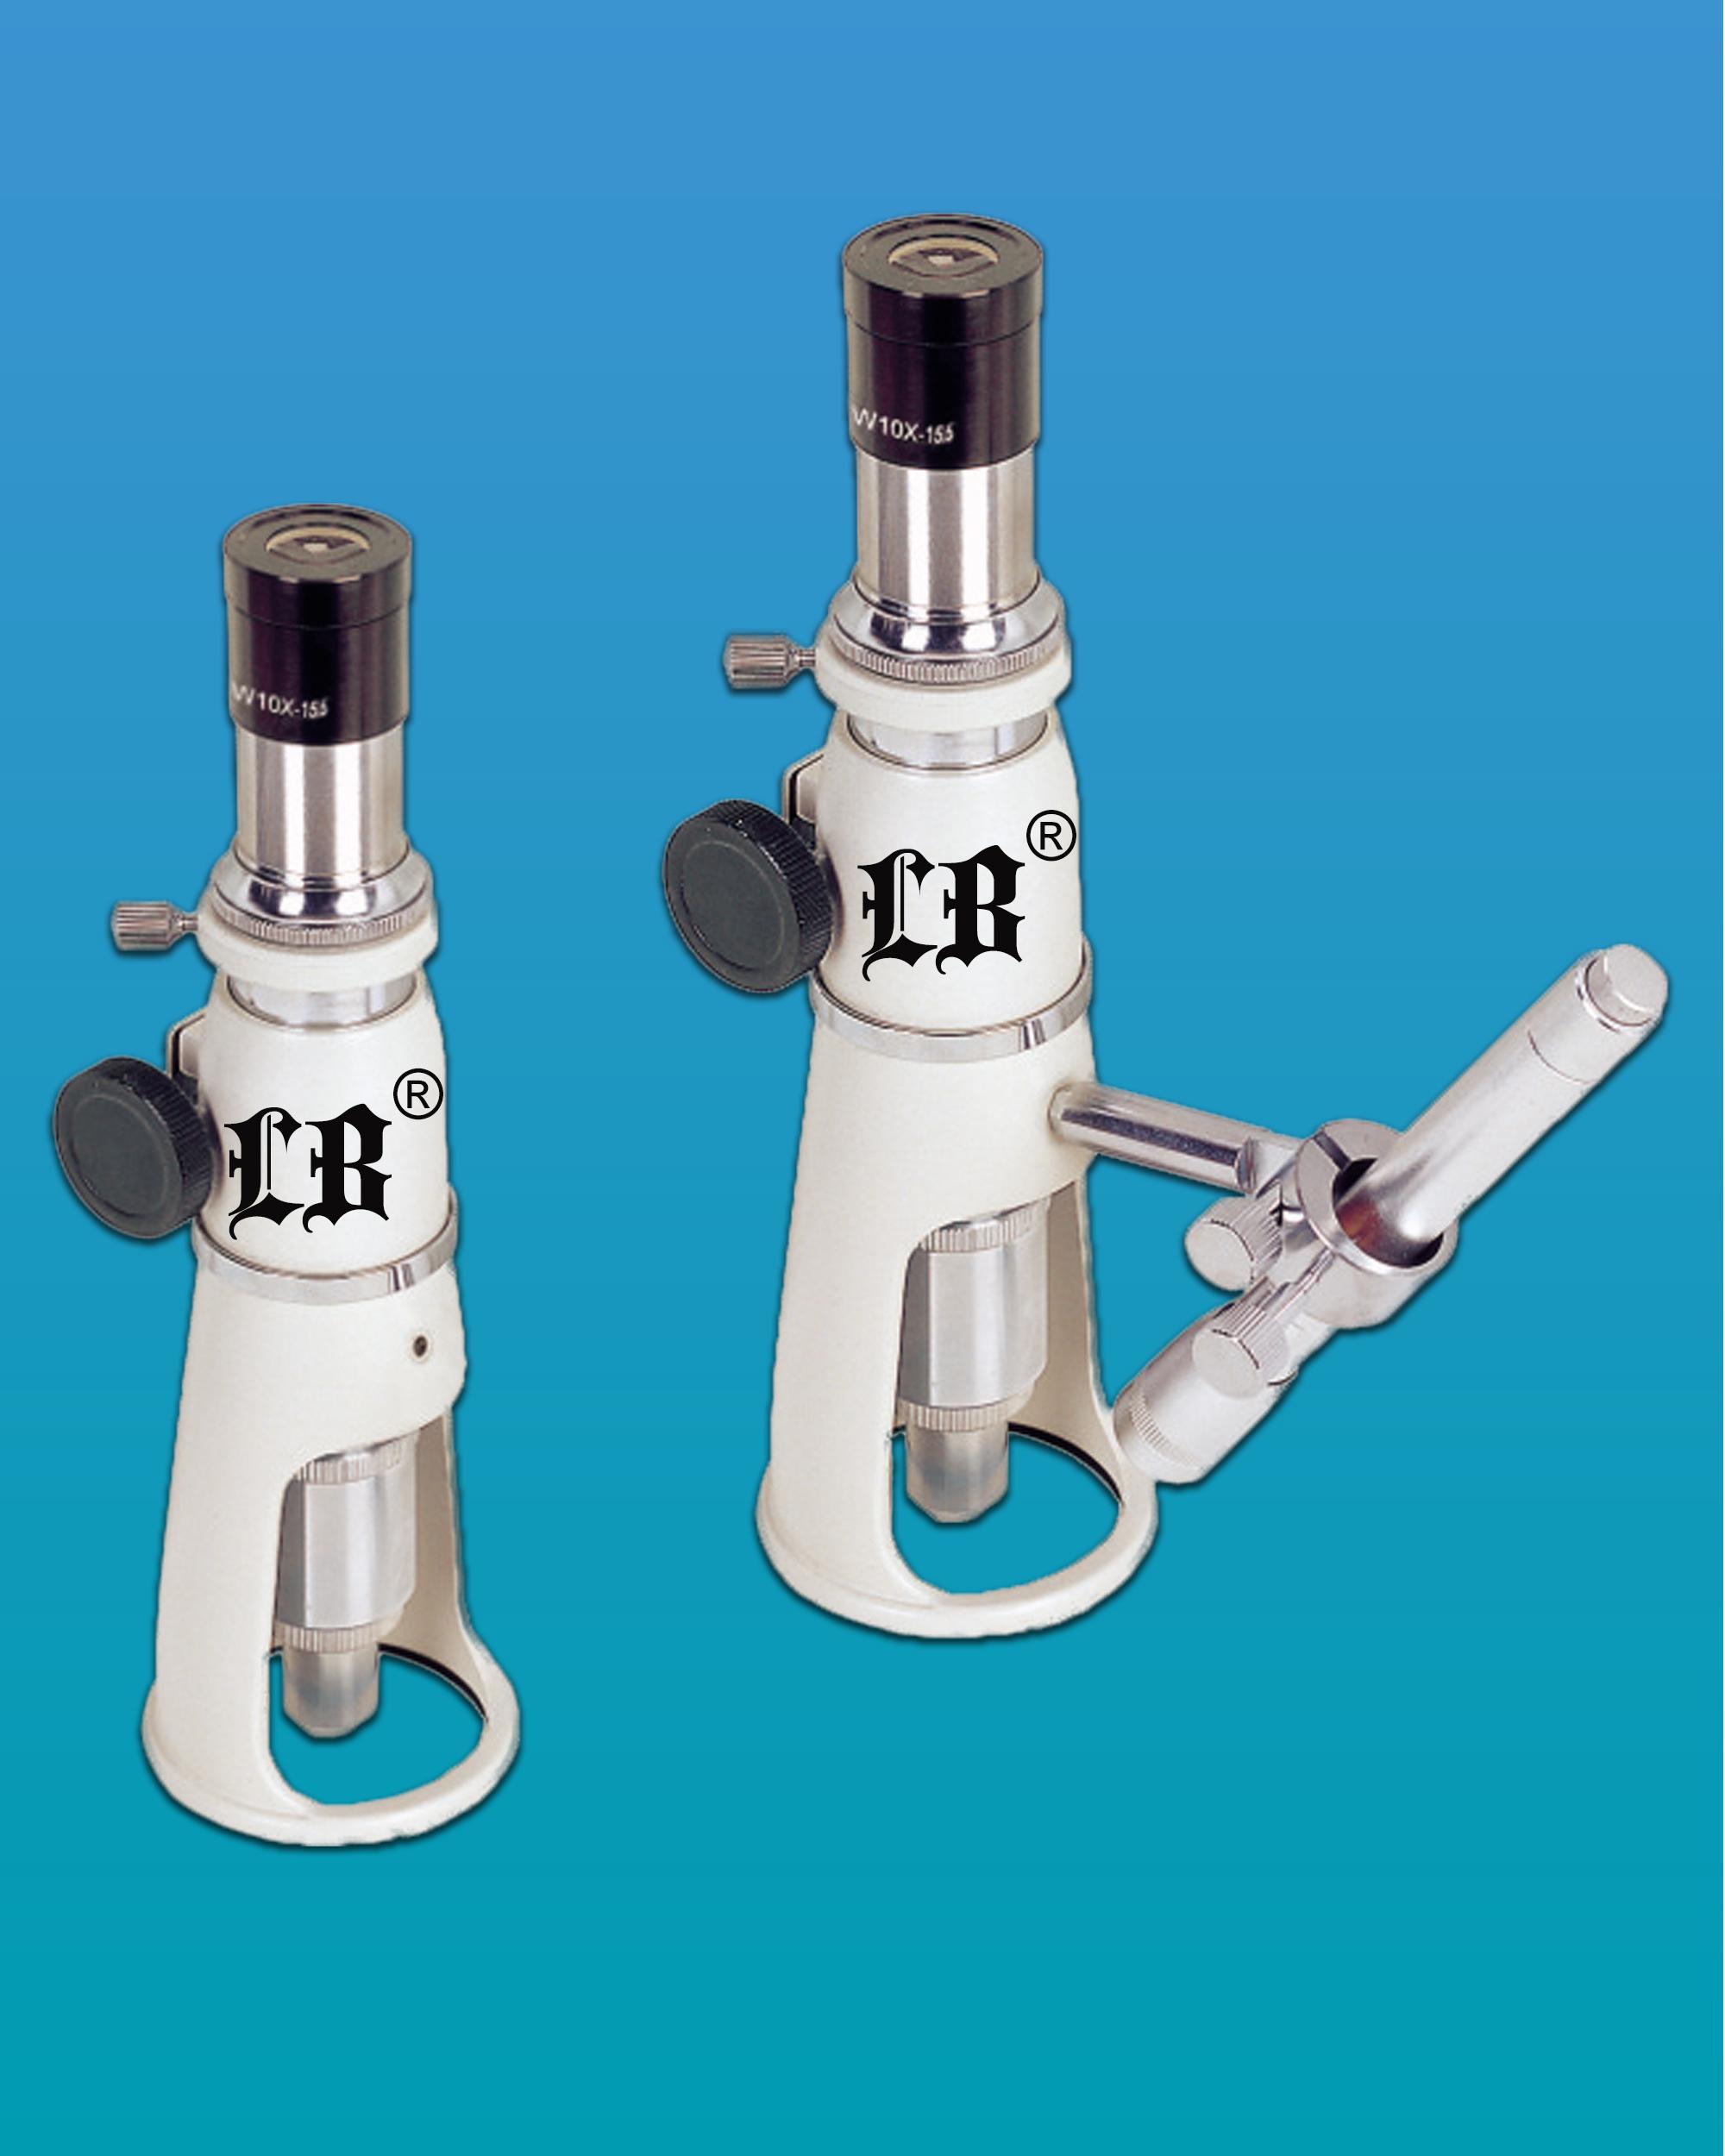 [LB-139] Portable Measuring Microscope w/ 20x Objective Zoom & LED Illumination